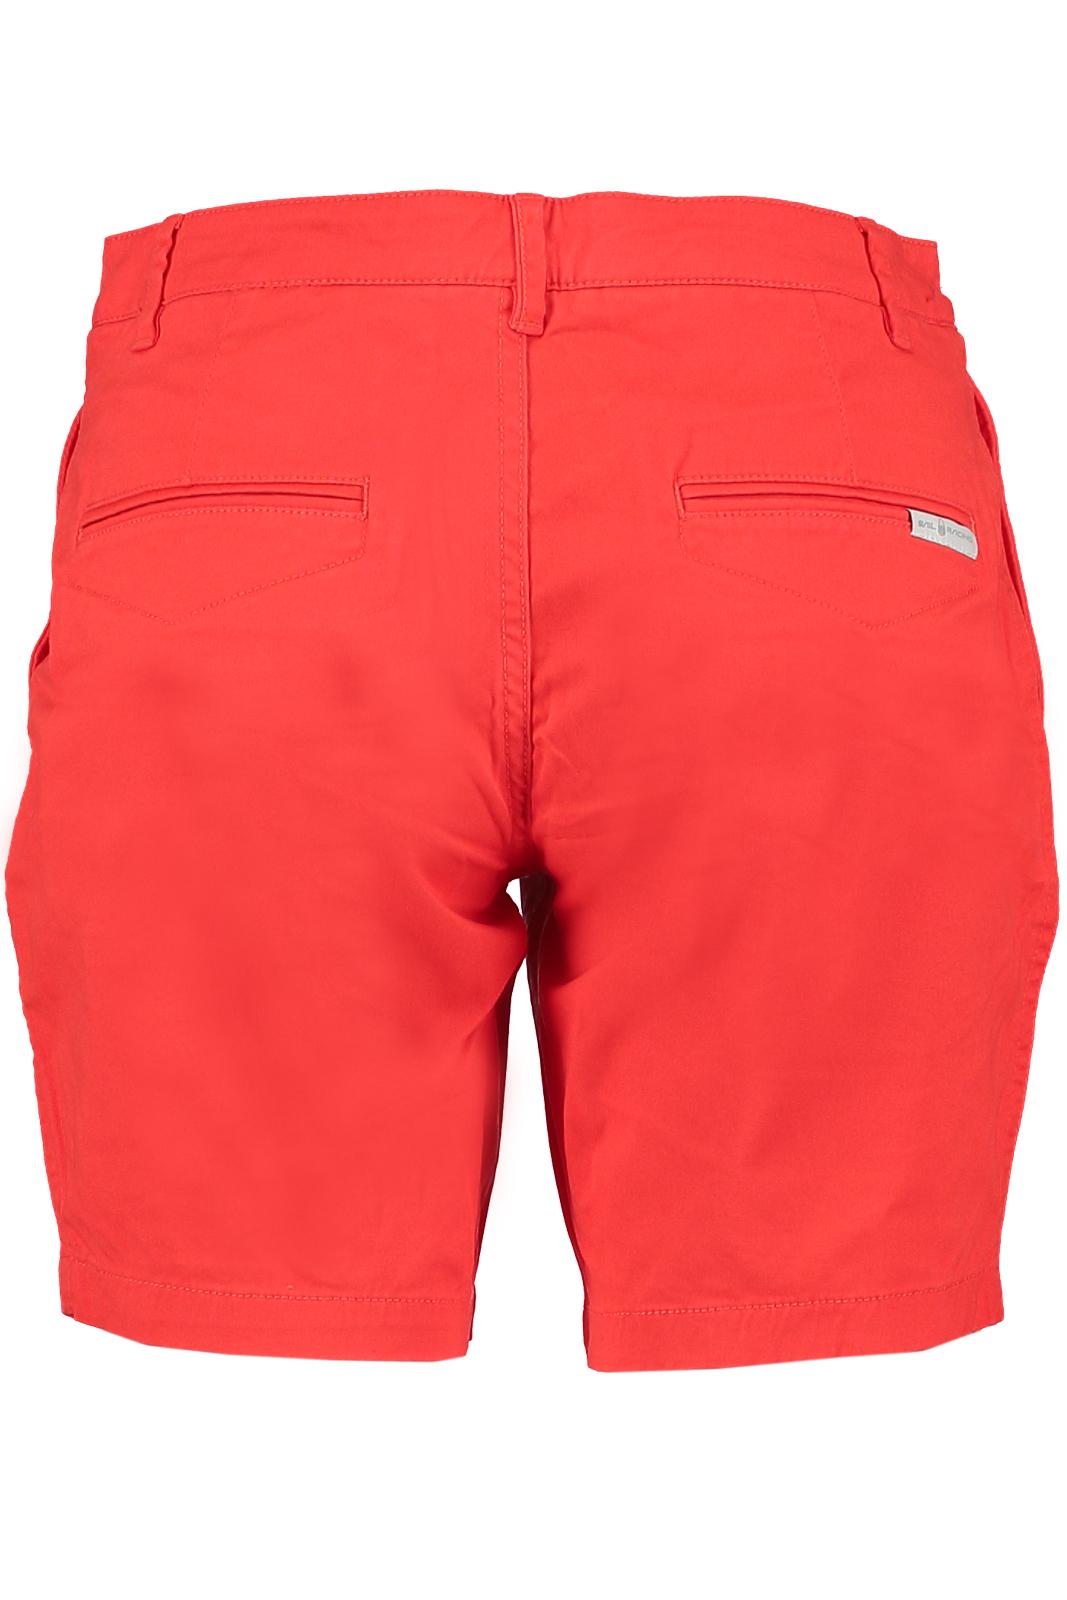 SAILRACING Shorts DAM Outlet 97d729a09b1a7